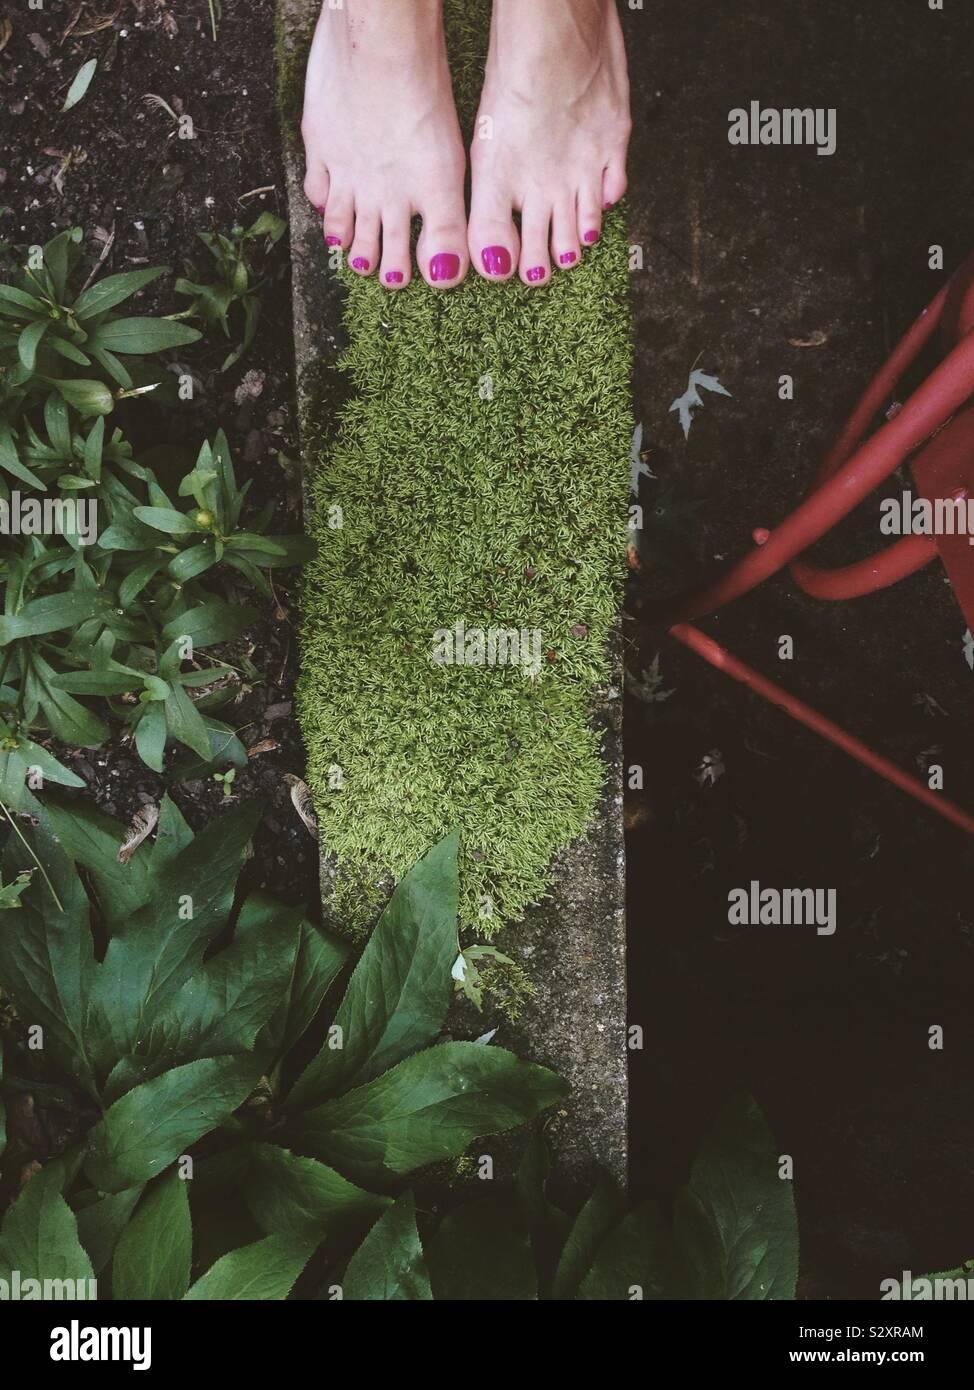 Chica de pie sobre un bloque de ceniza musgosas divisor en un jardín. Foto de stock